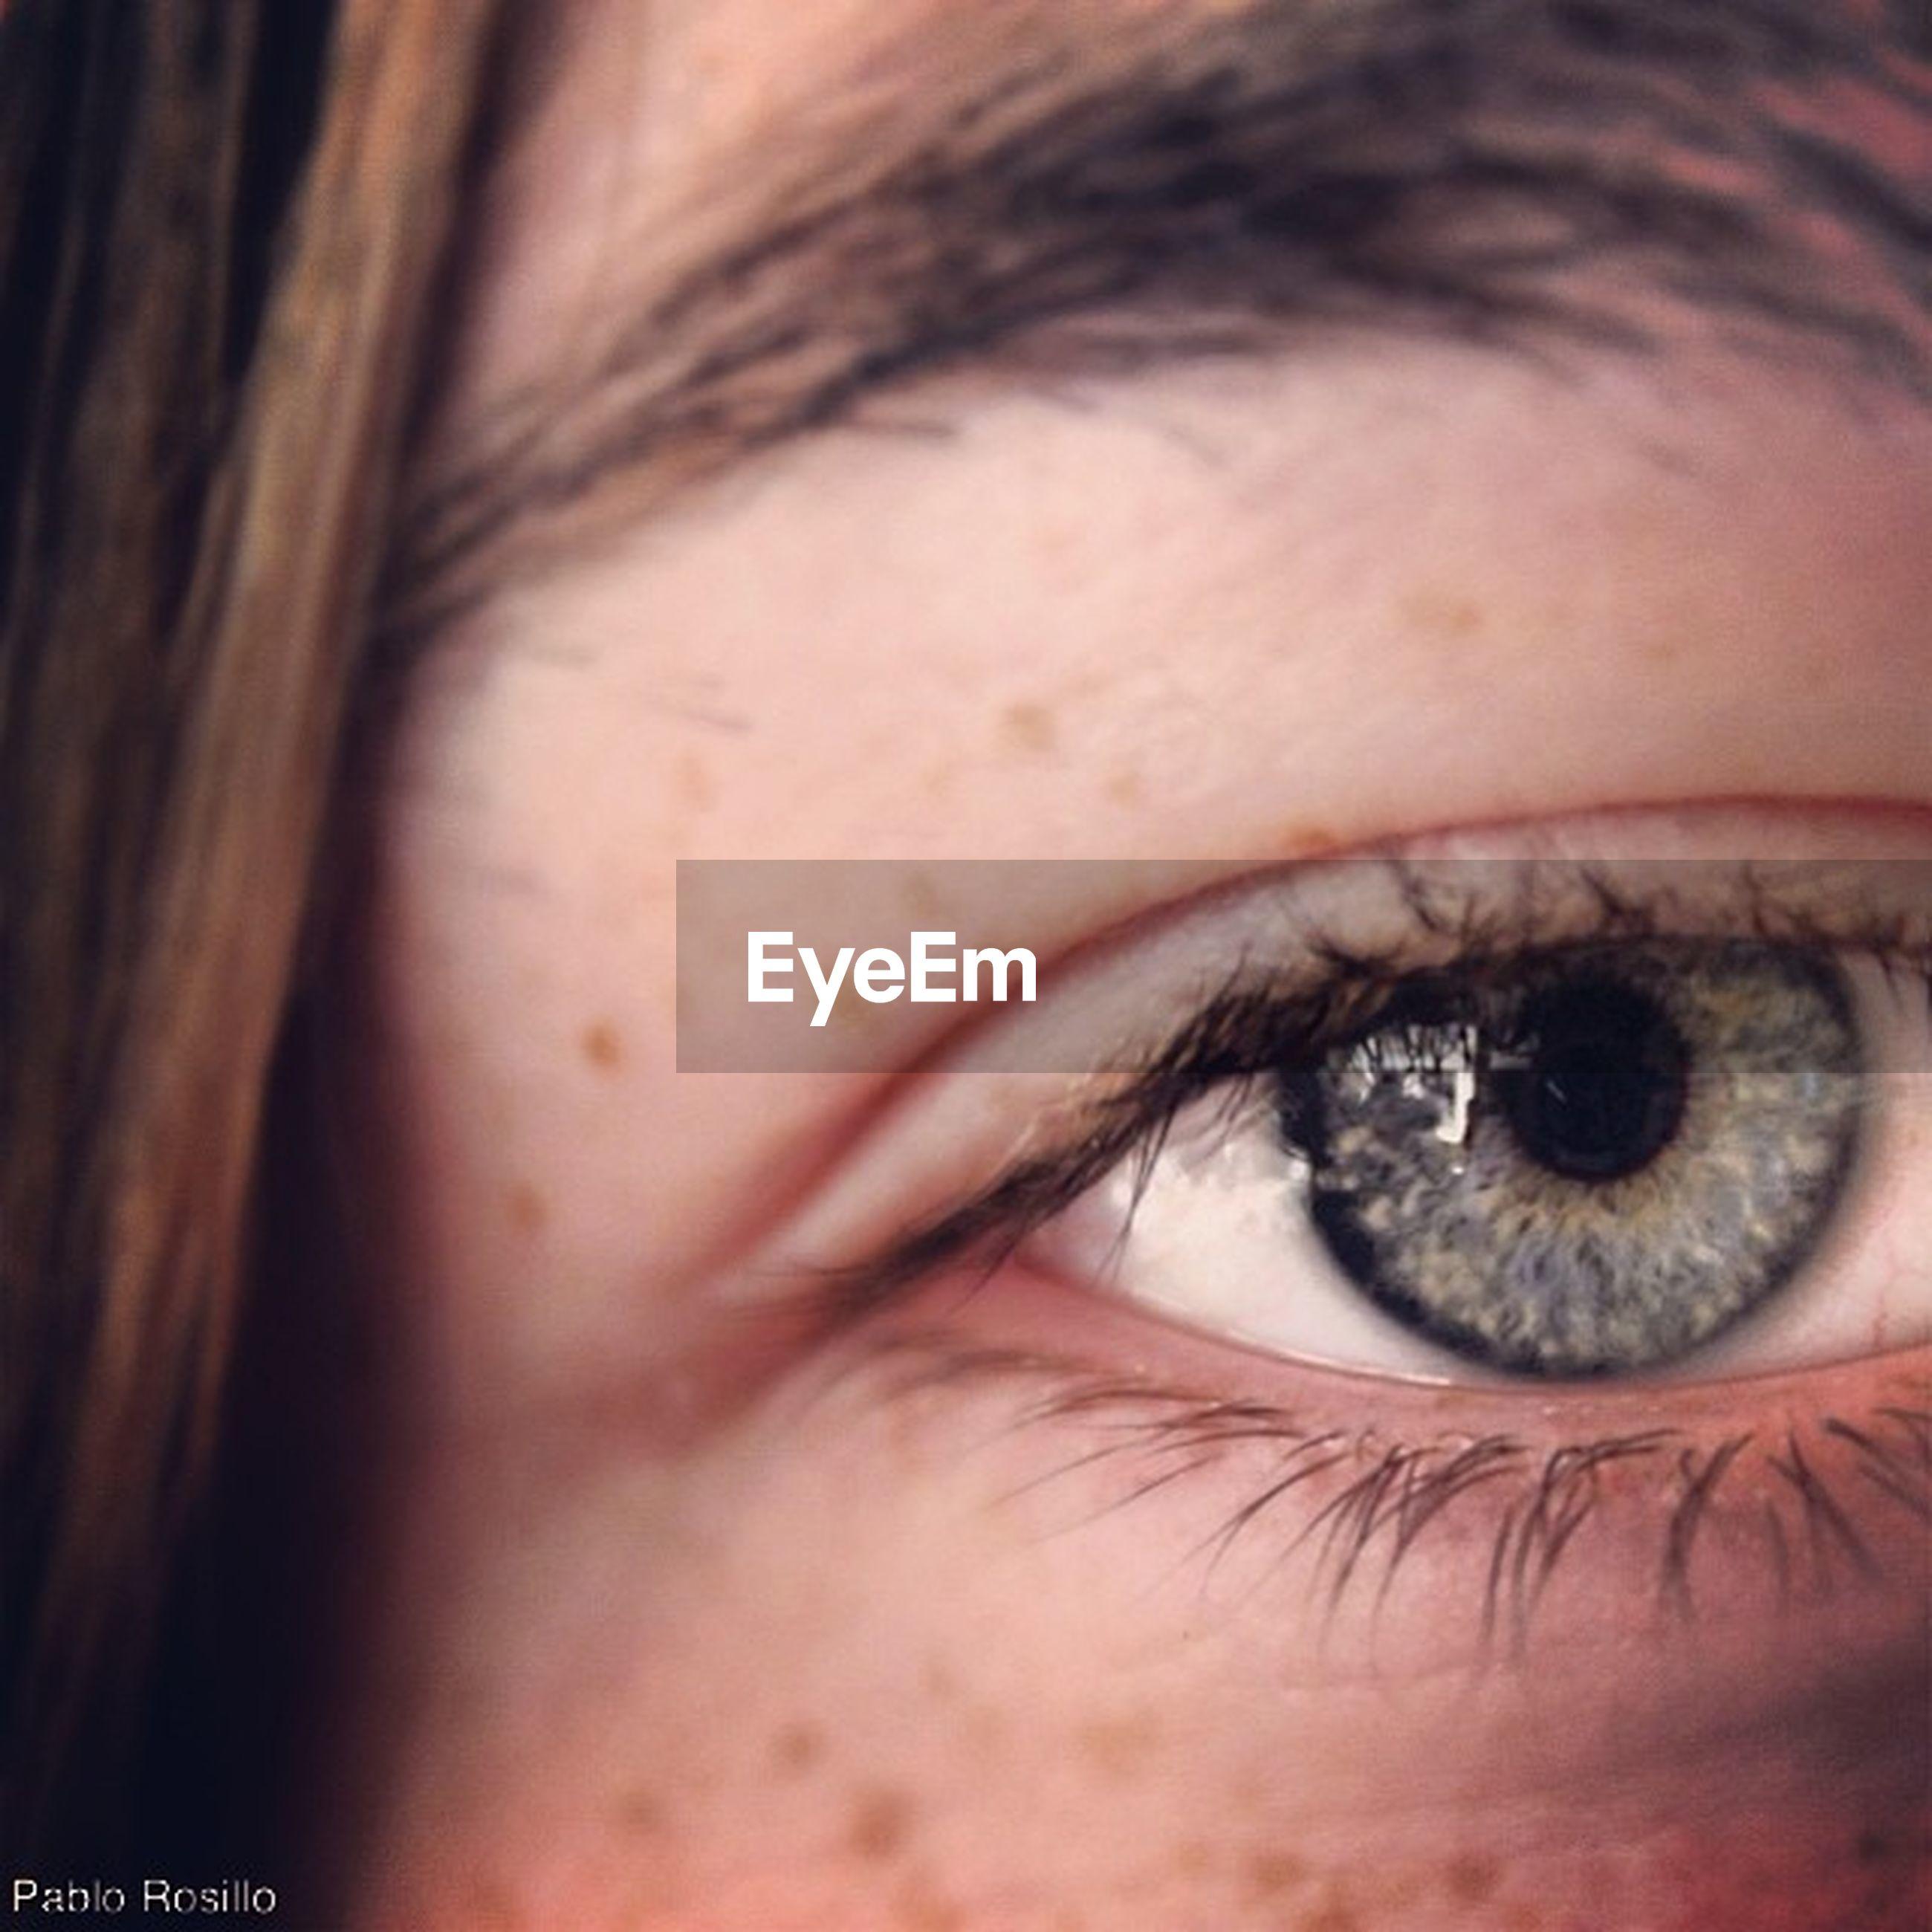 human eye, close-up, eyelash, looking at camera, headshot, portrait, human face, eyesight, lifestyles, young adult, person, human skin, sensory perception, young women, part of, eyebrow, eyeball